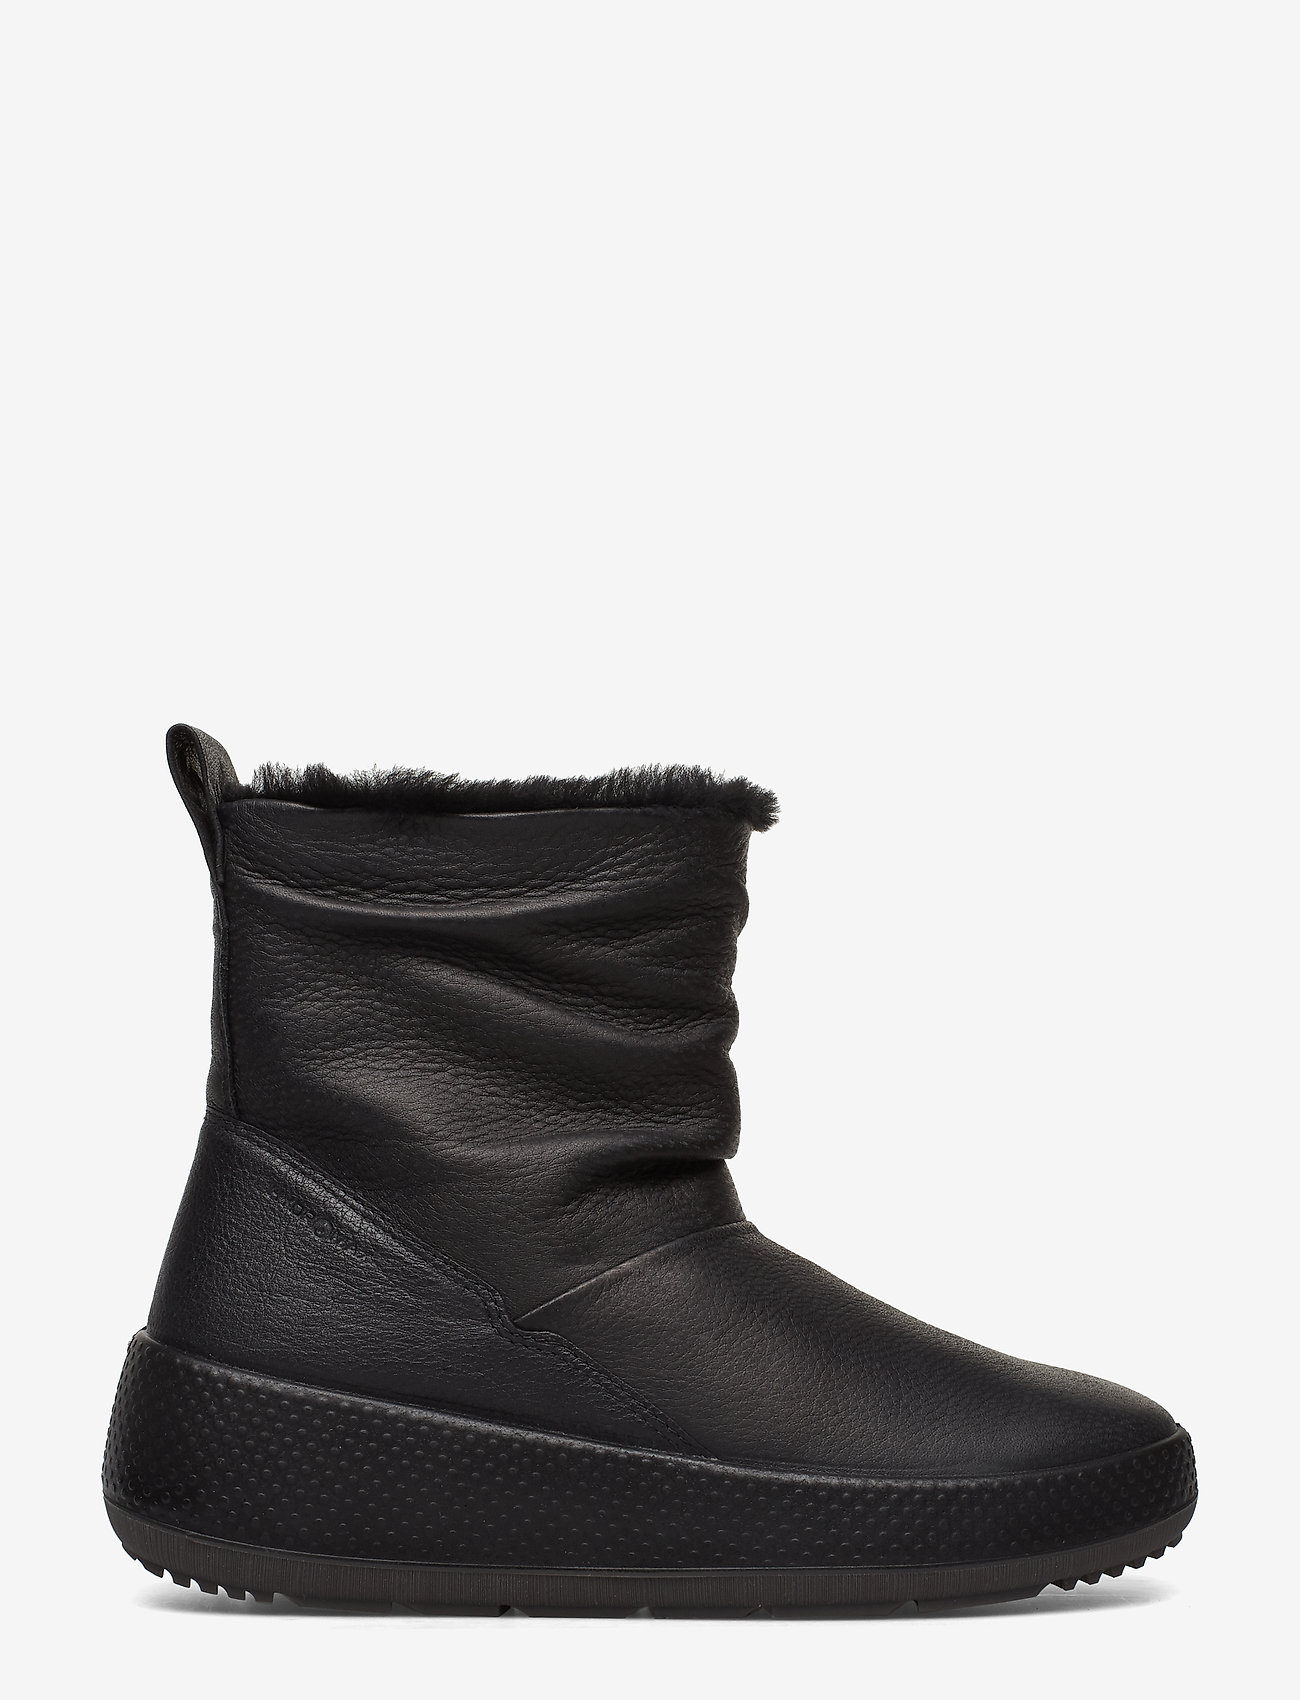 ECCO - UKIUK 2.0 - flat ankle boots - black - 0